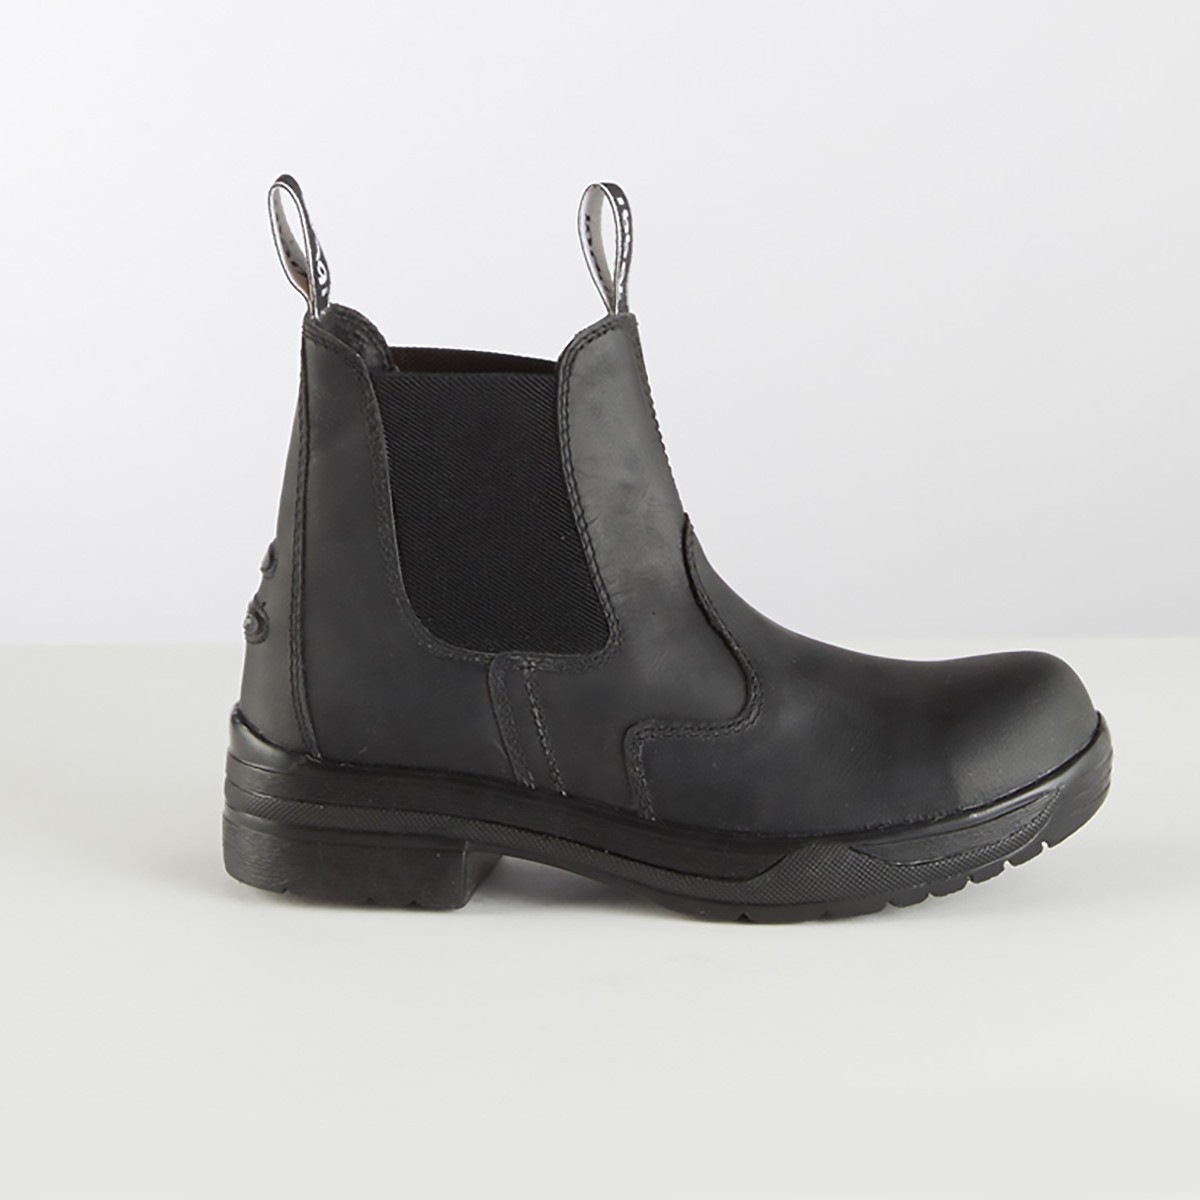 Toggi Kodiac Protective Steel Toe Cap Black Jodhpur Boots